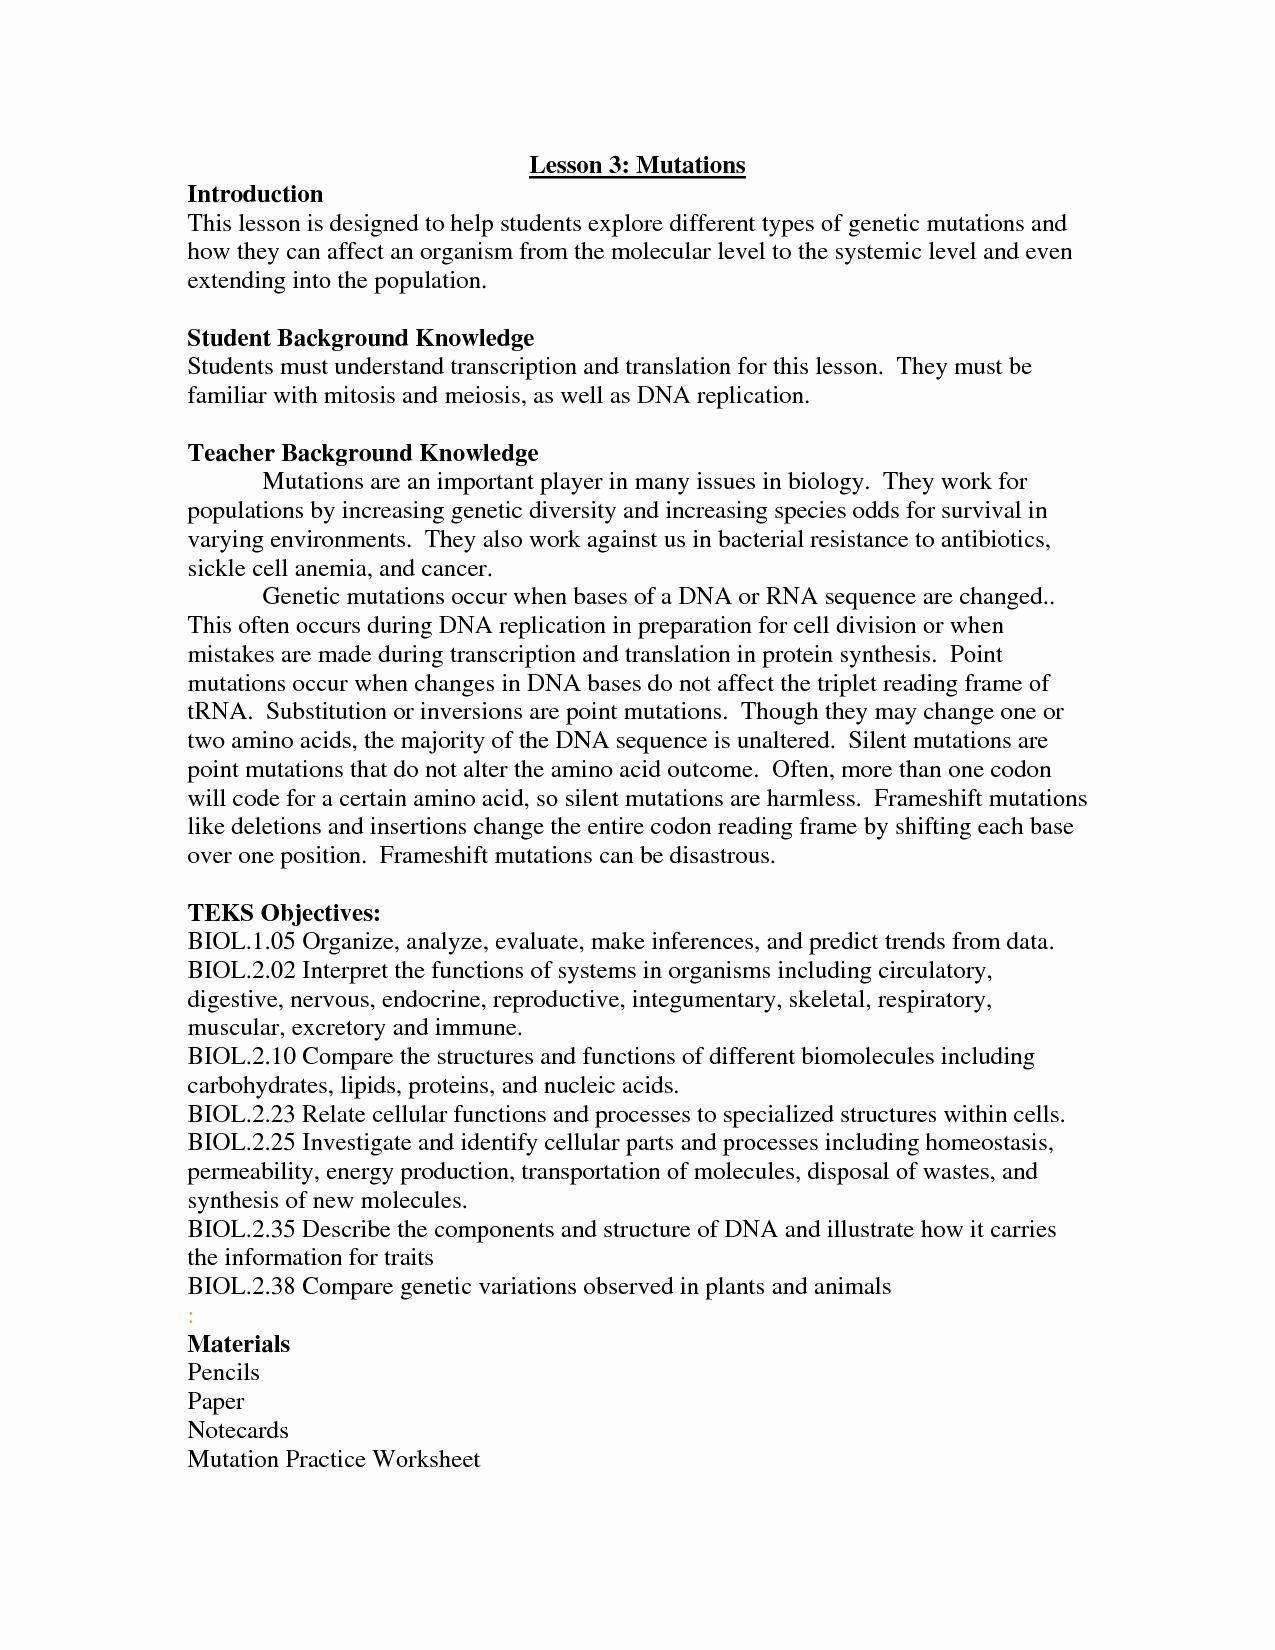 Mutations Worksheet Answer Key Fresh 17 Best Of Dna Mutations Practice Worksheet Page 2